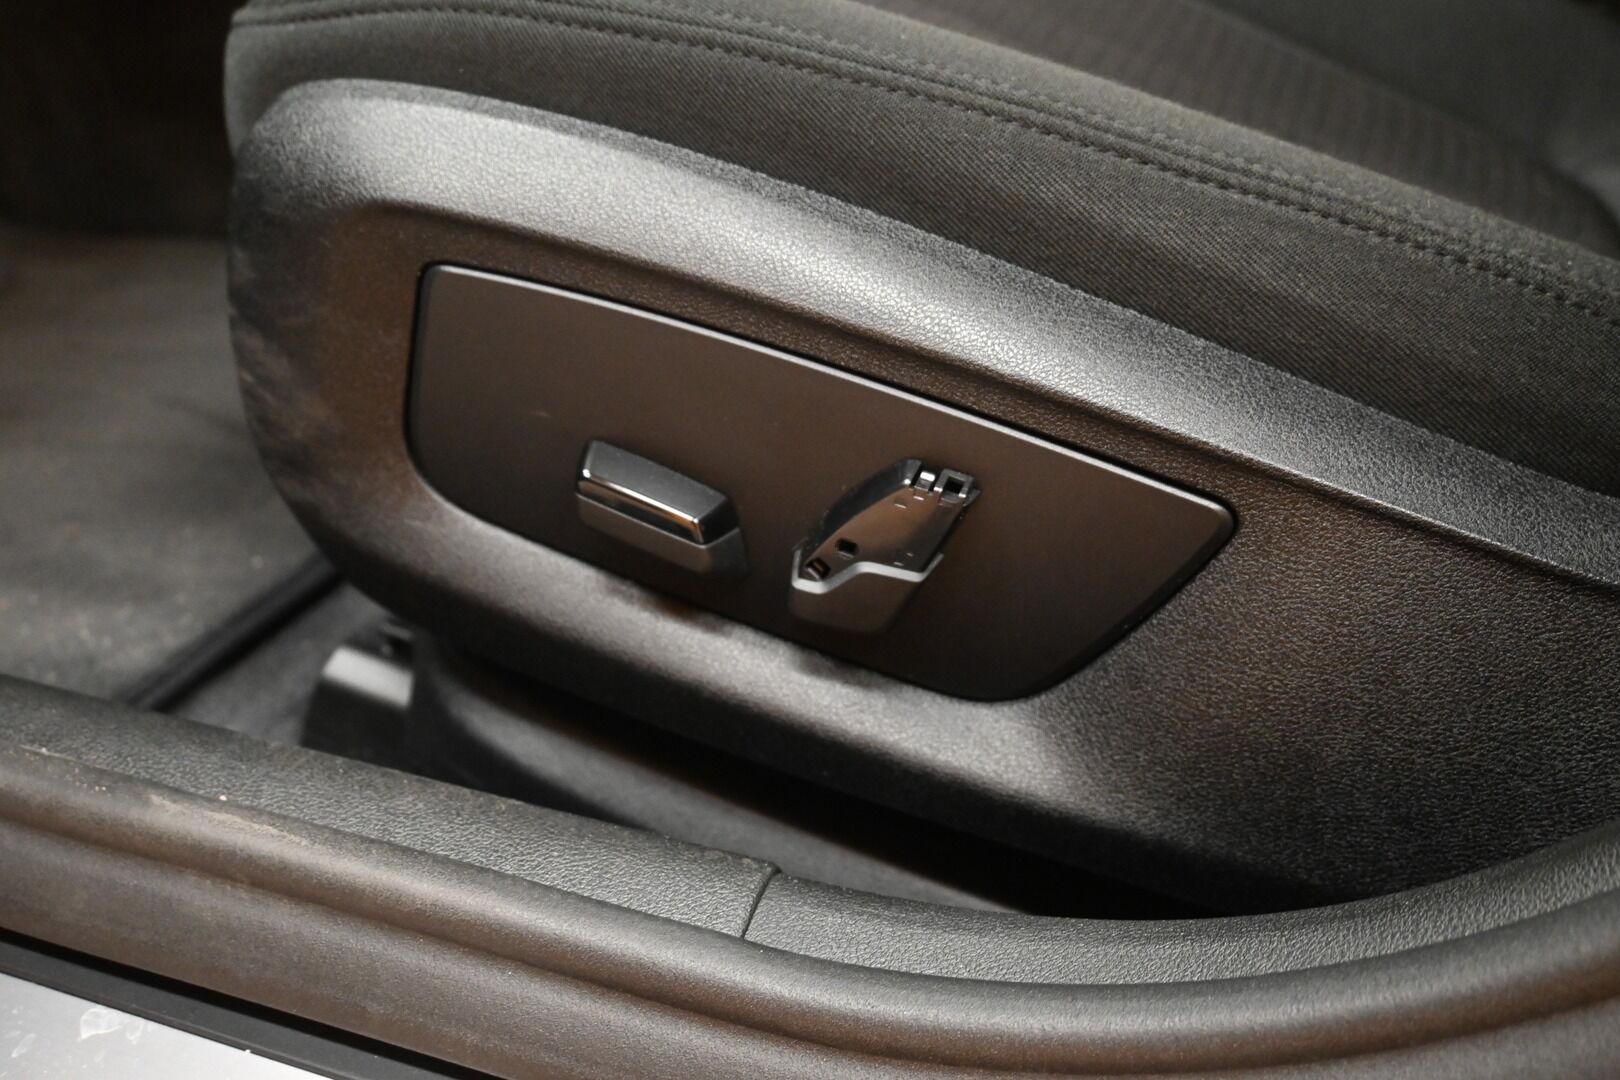 Musta Sedan, BMW 530 – KON-32251, kuva 20